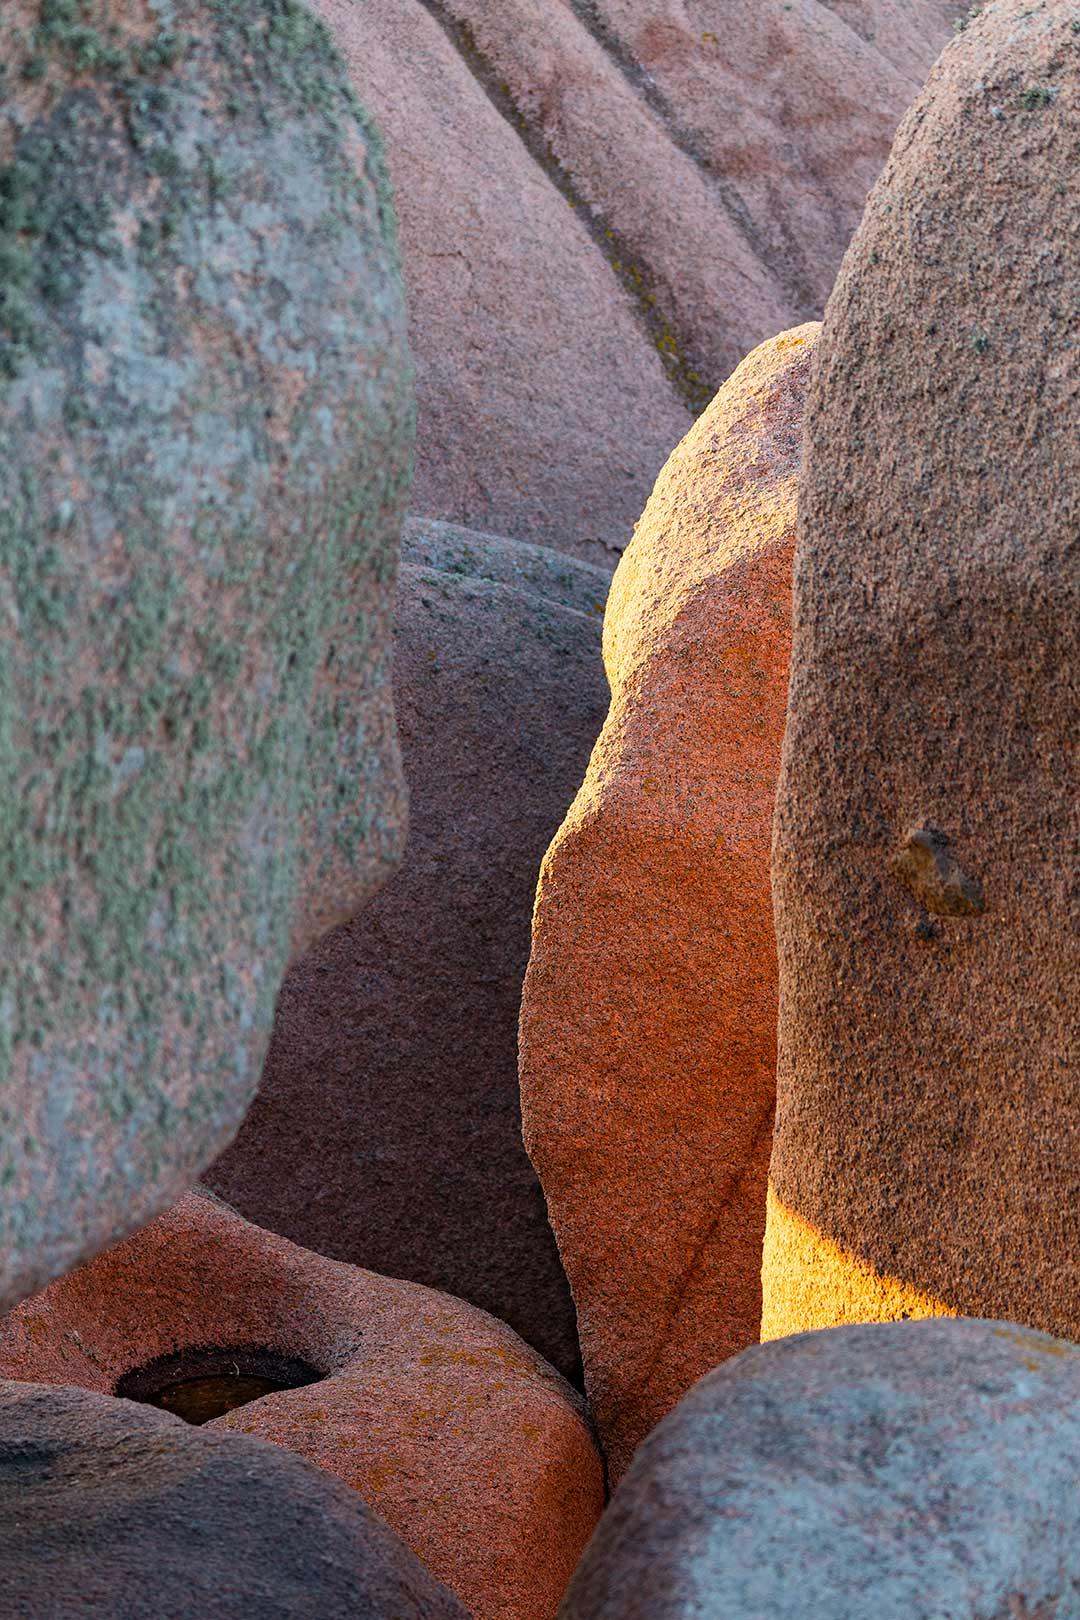 Landschaftsfotografie: Côte de Granit Rose – felsige Farbe- und Schattenspiele | Foto: Dieter Eikenberg, imprints